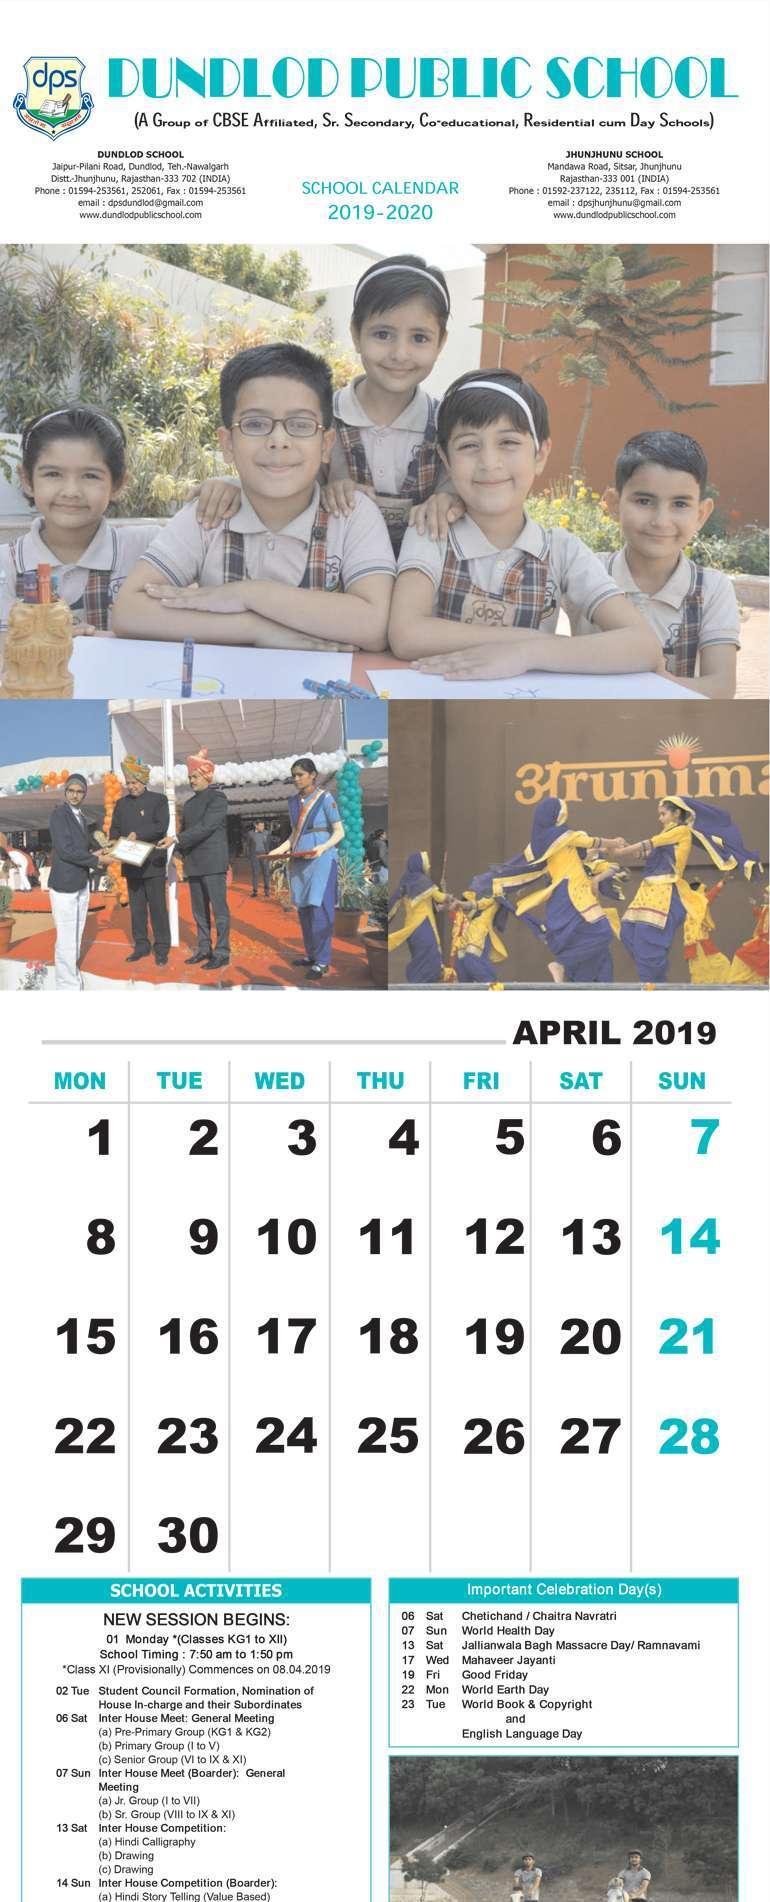 Dps Calendar.School Calendar Dundlod Public School